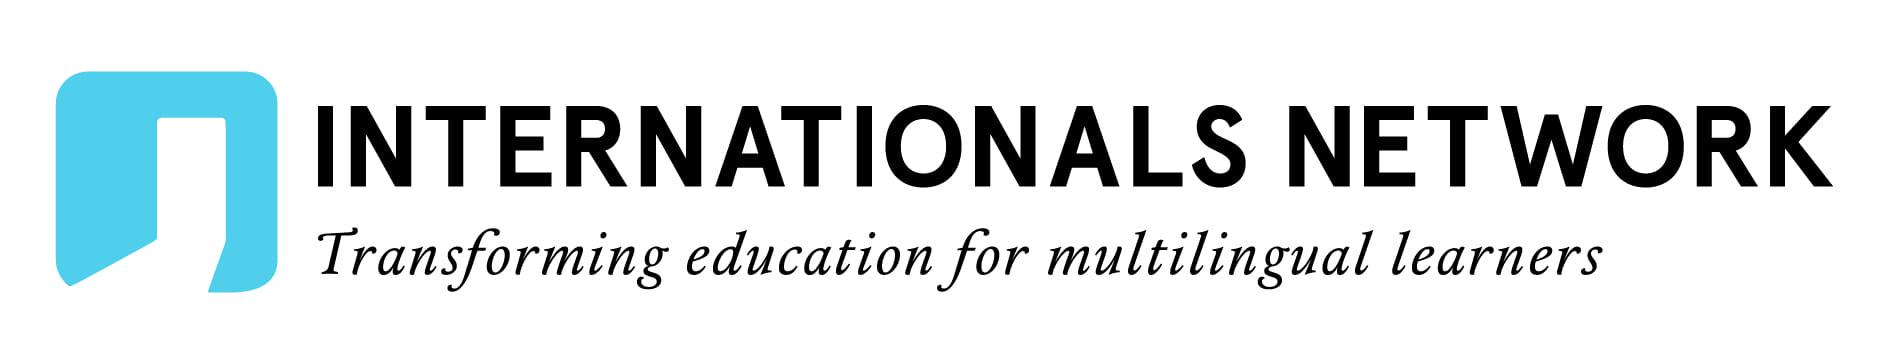 Internationals Network Logo